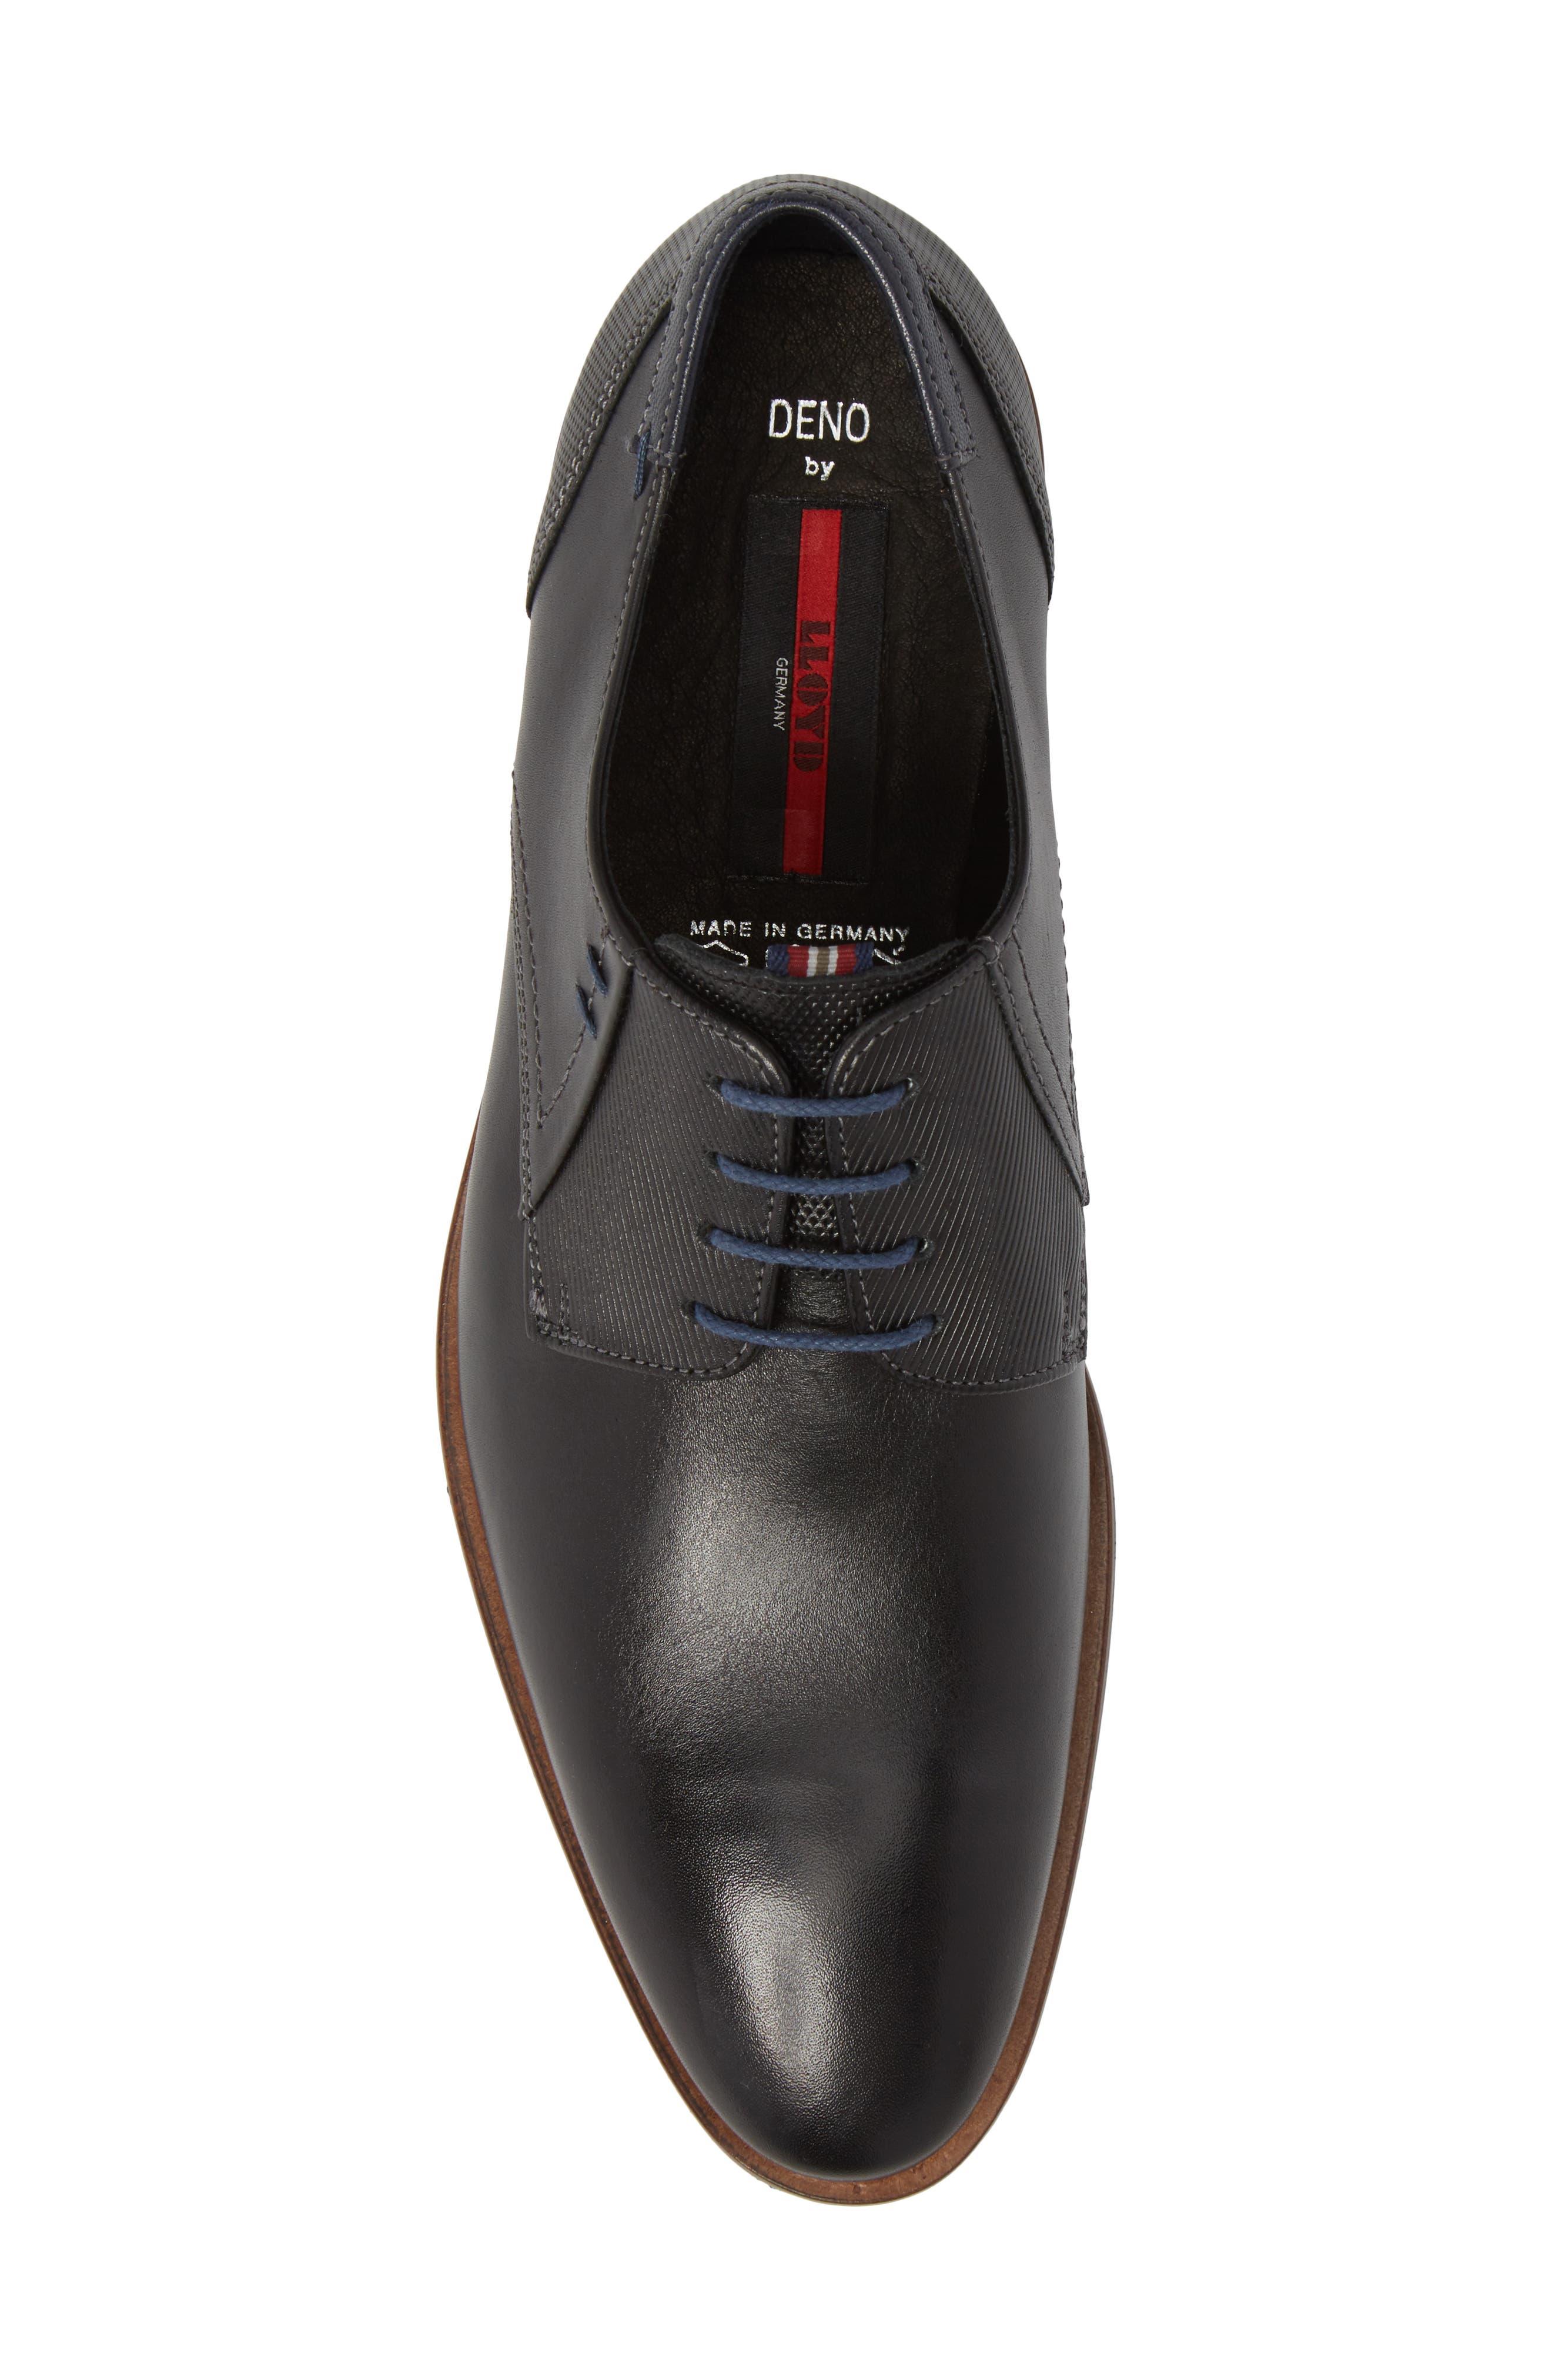 Deno Plain Toe Derby,                             Alternate thumbnail 5, color,                             Black/ Blue Leather